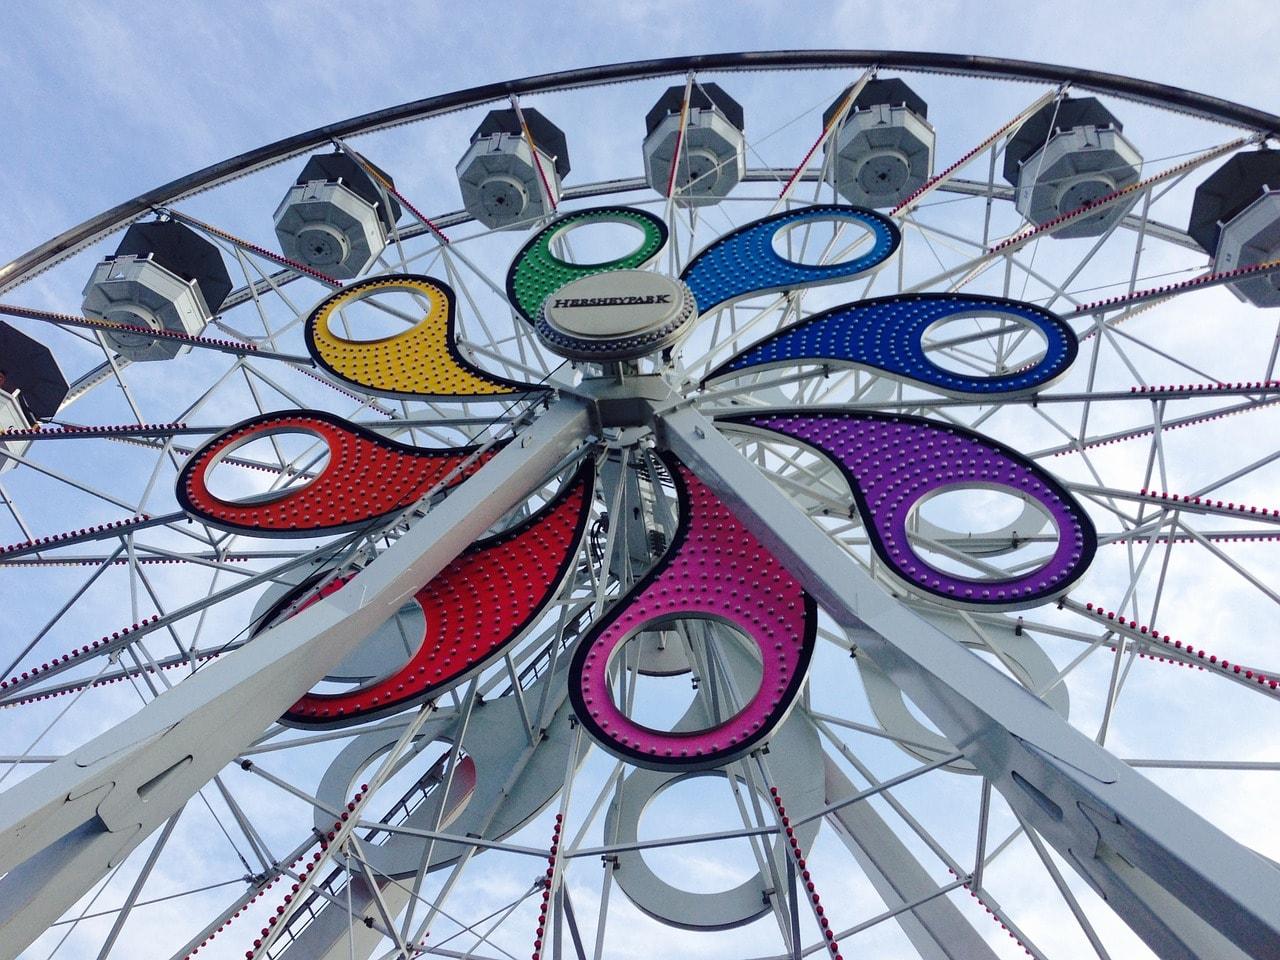 ferris-wheel-1236415_1280